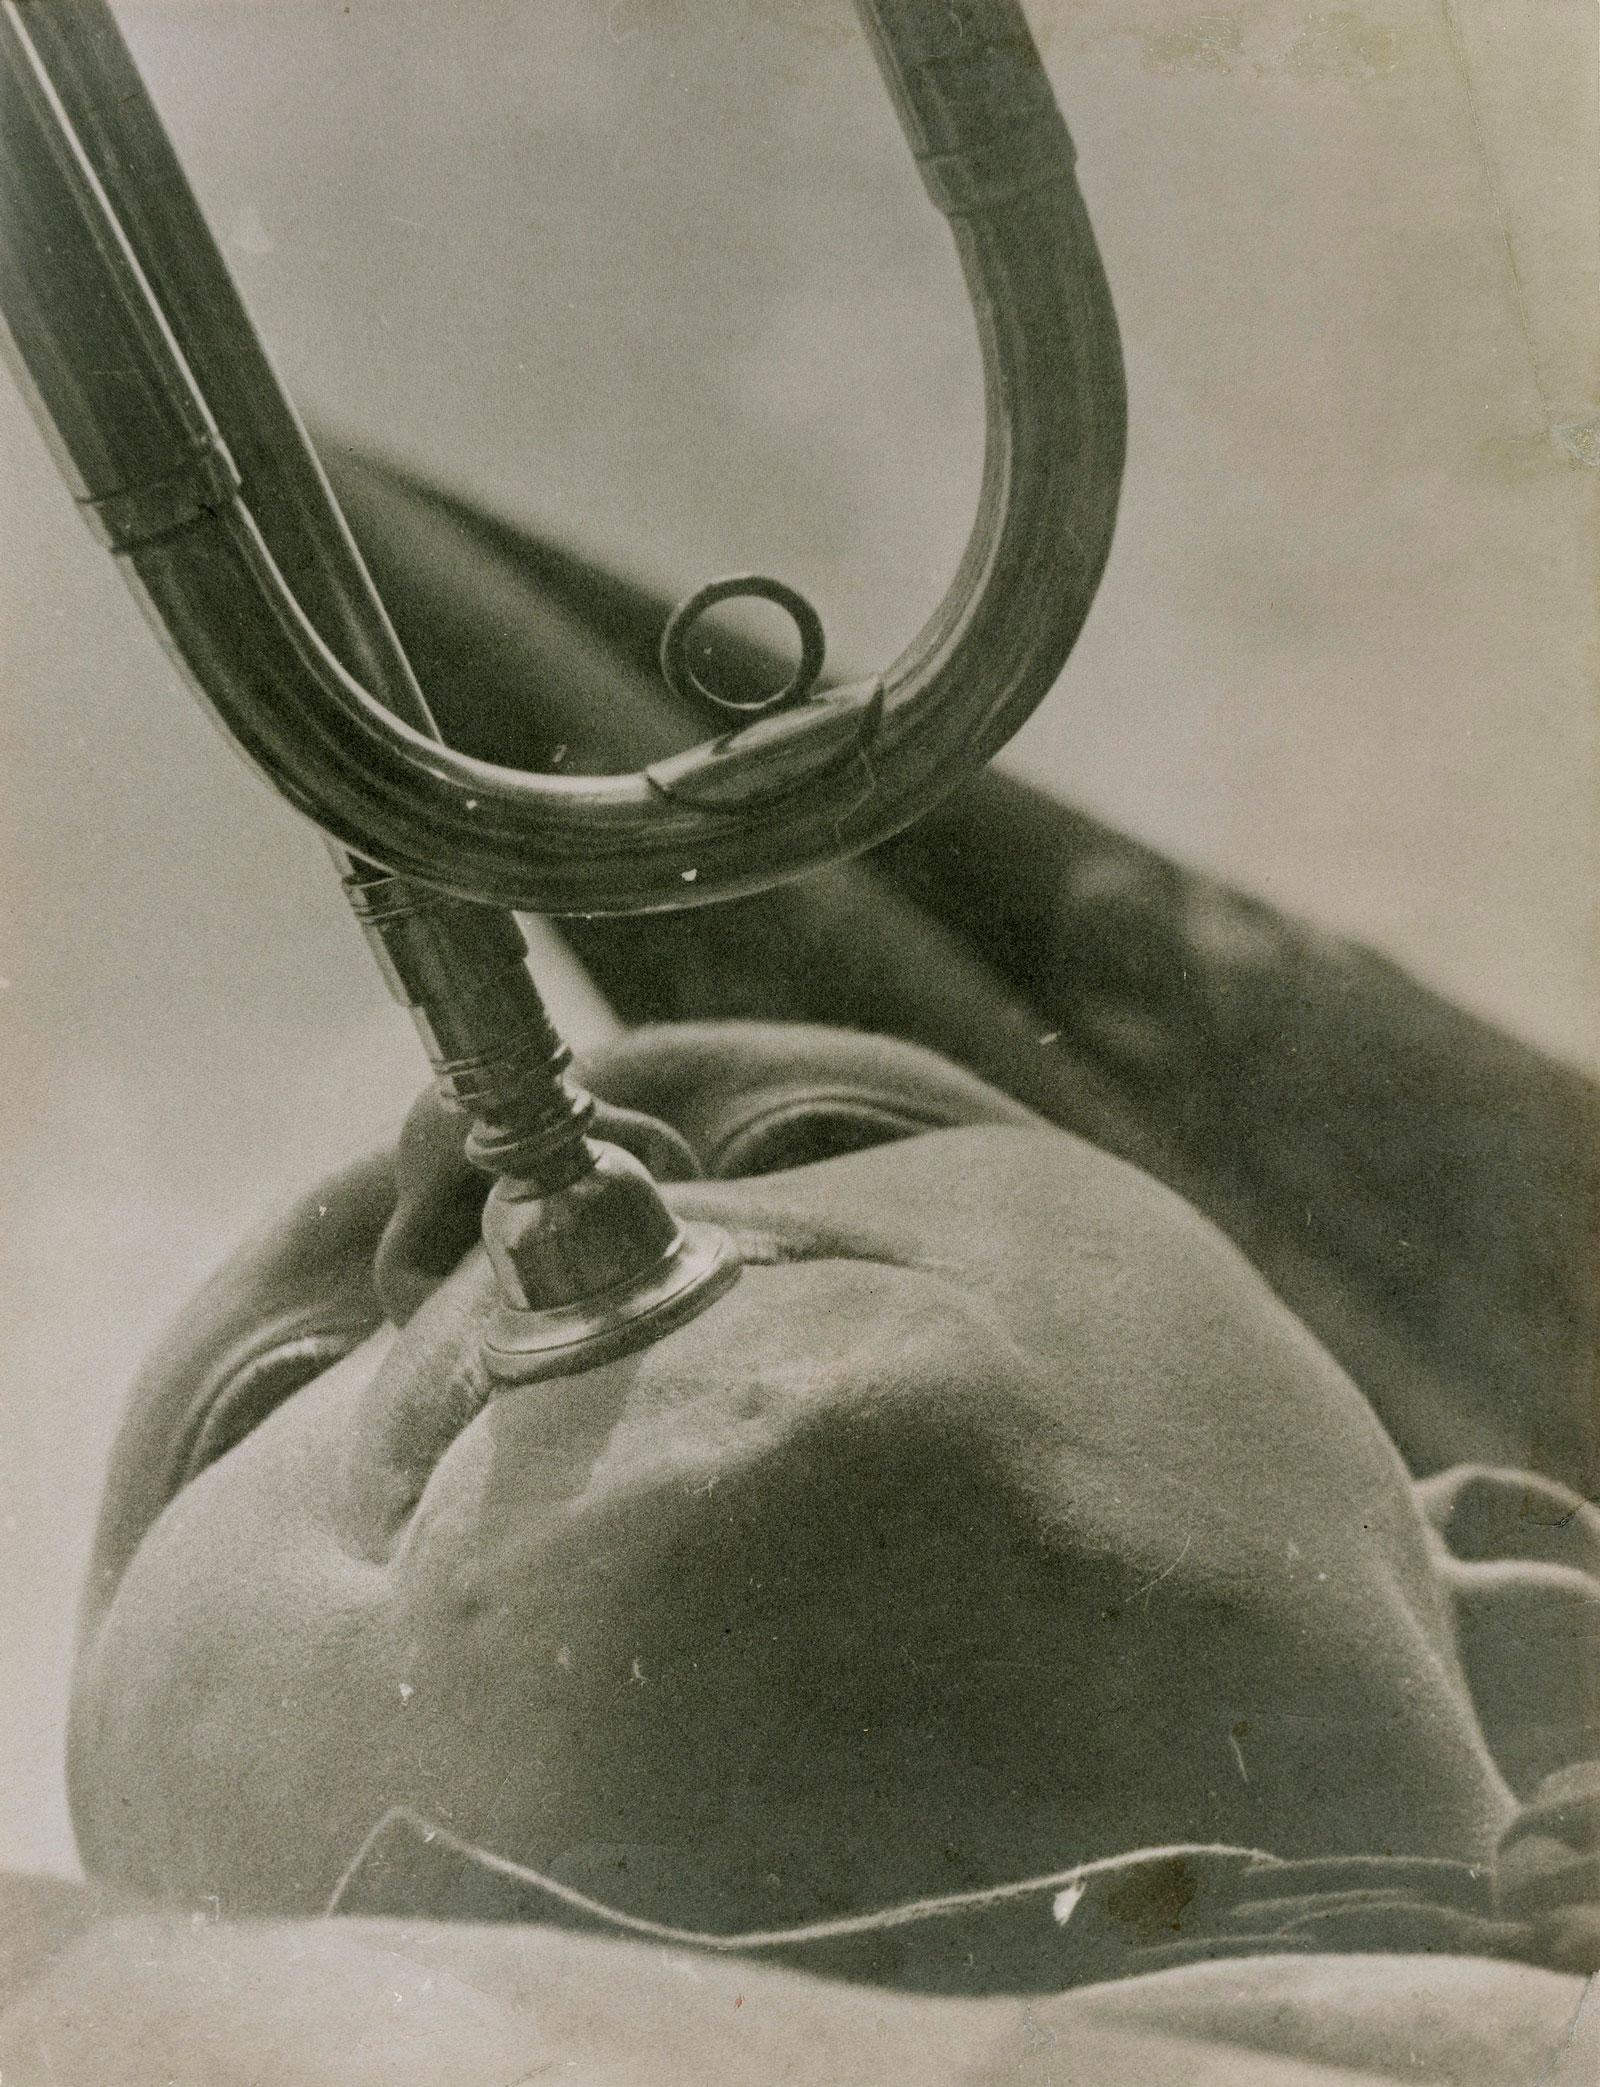 Alexander Rodchenko: Pioneer Playing a Trumpet, 1930